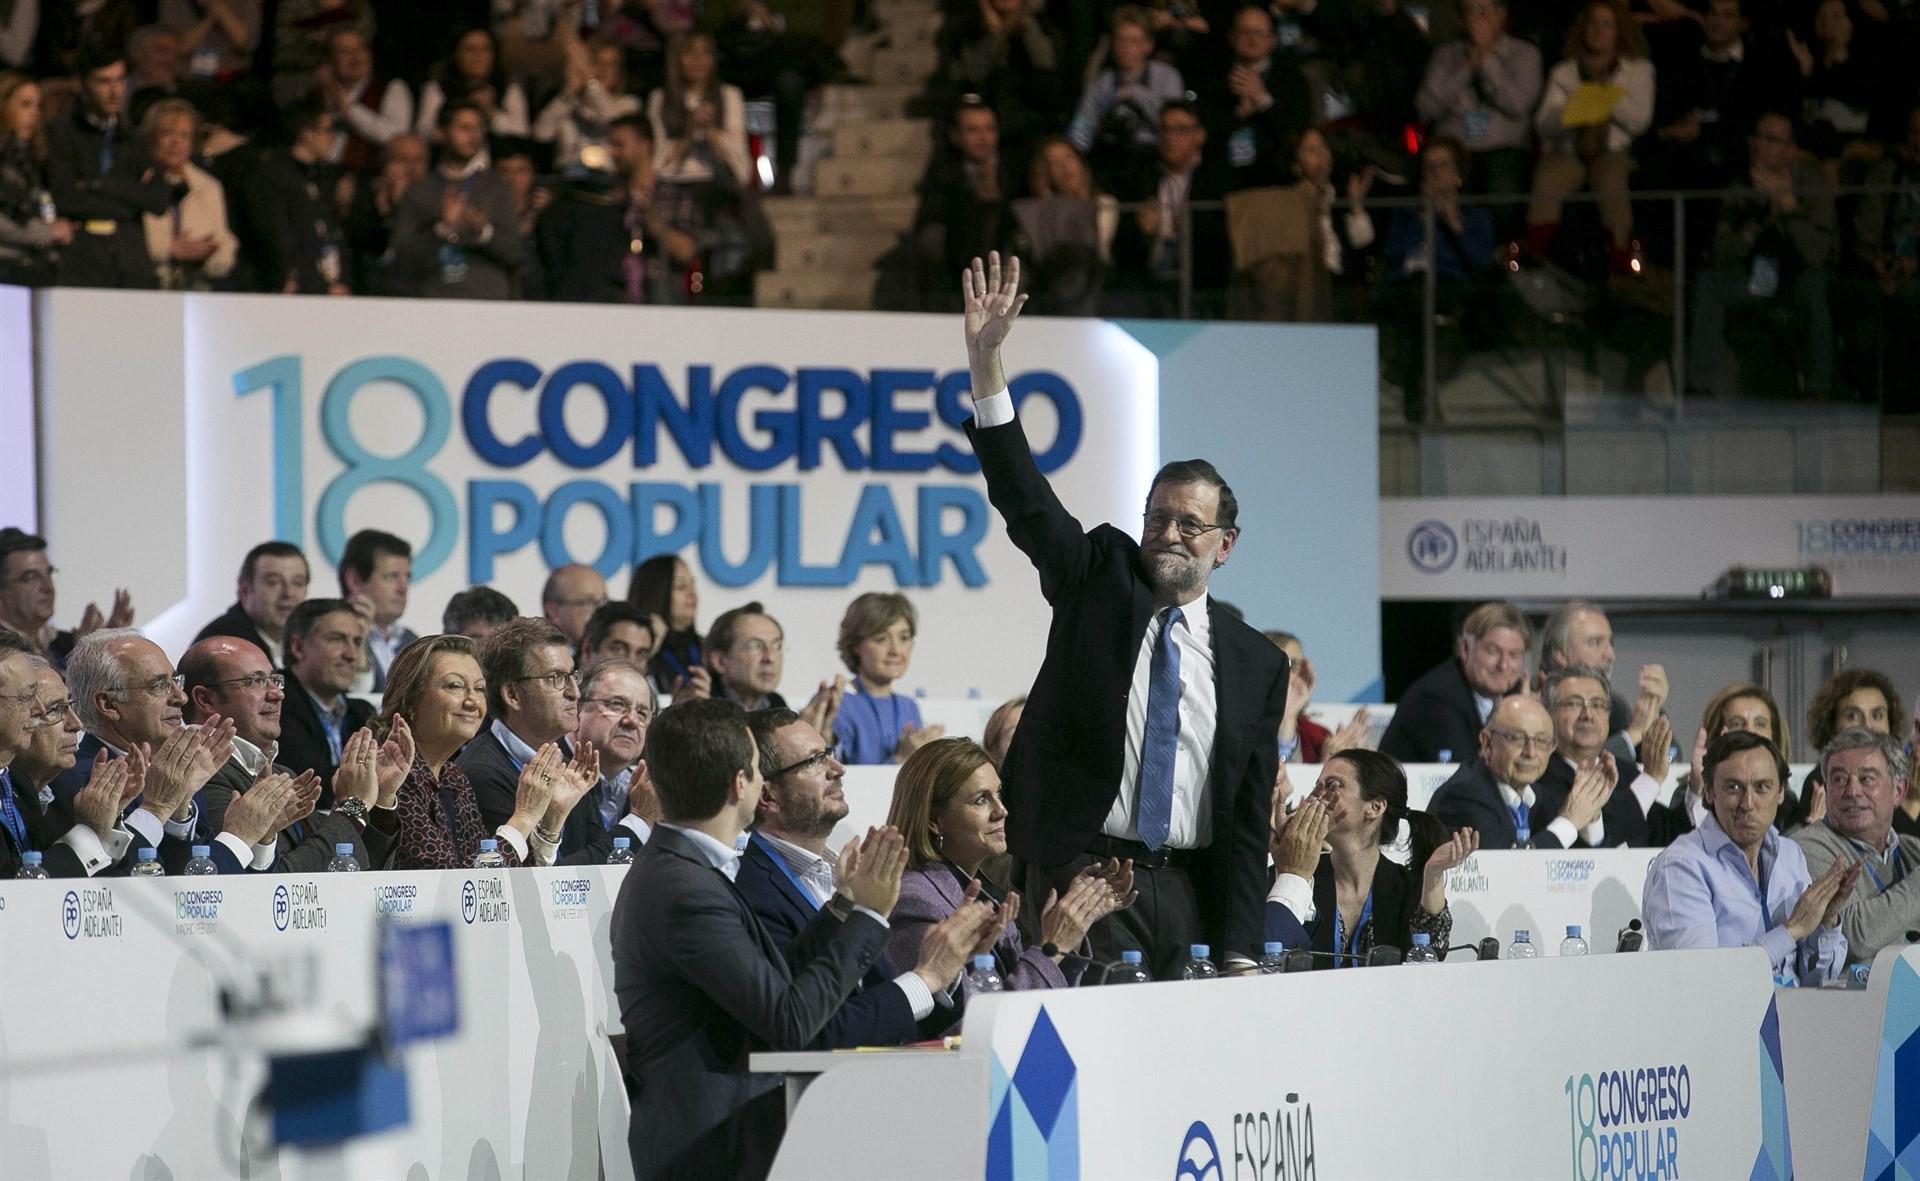 Rajoycongresopp